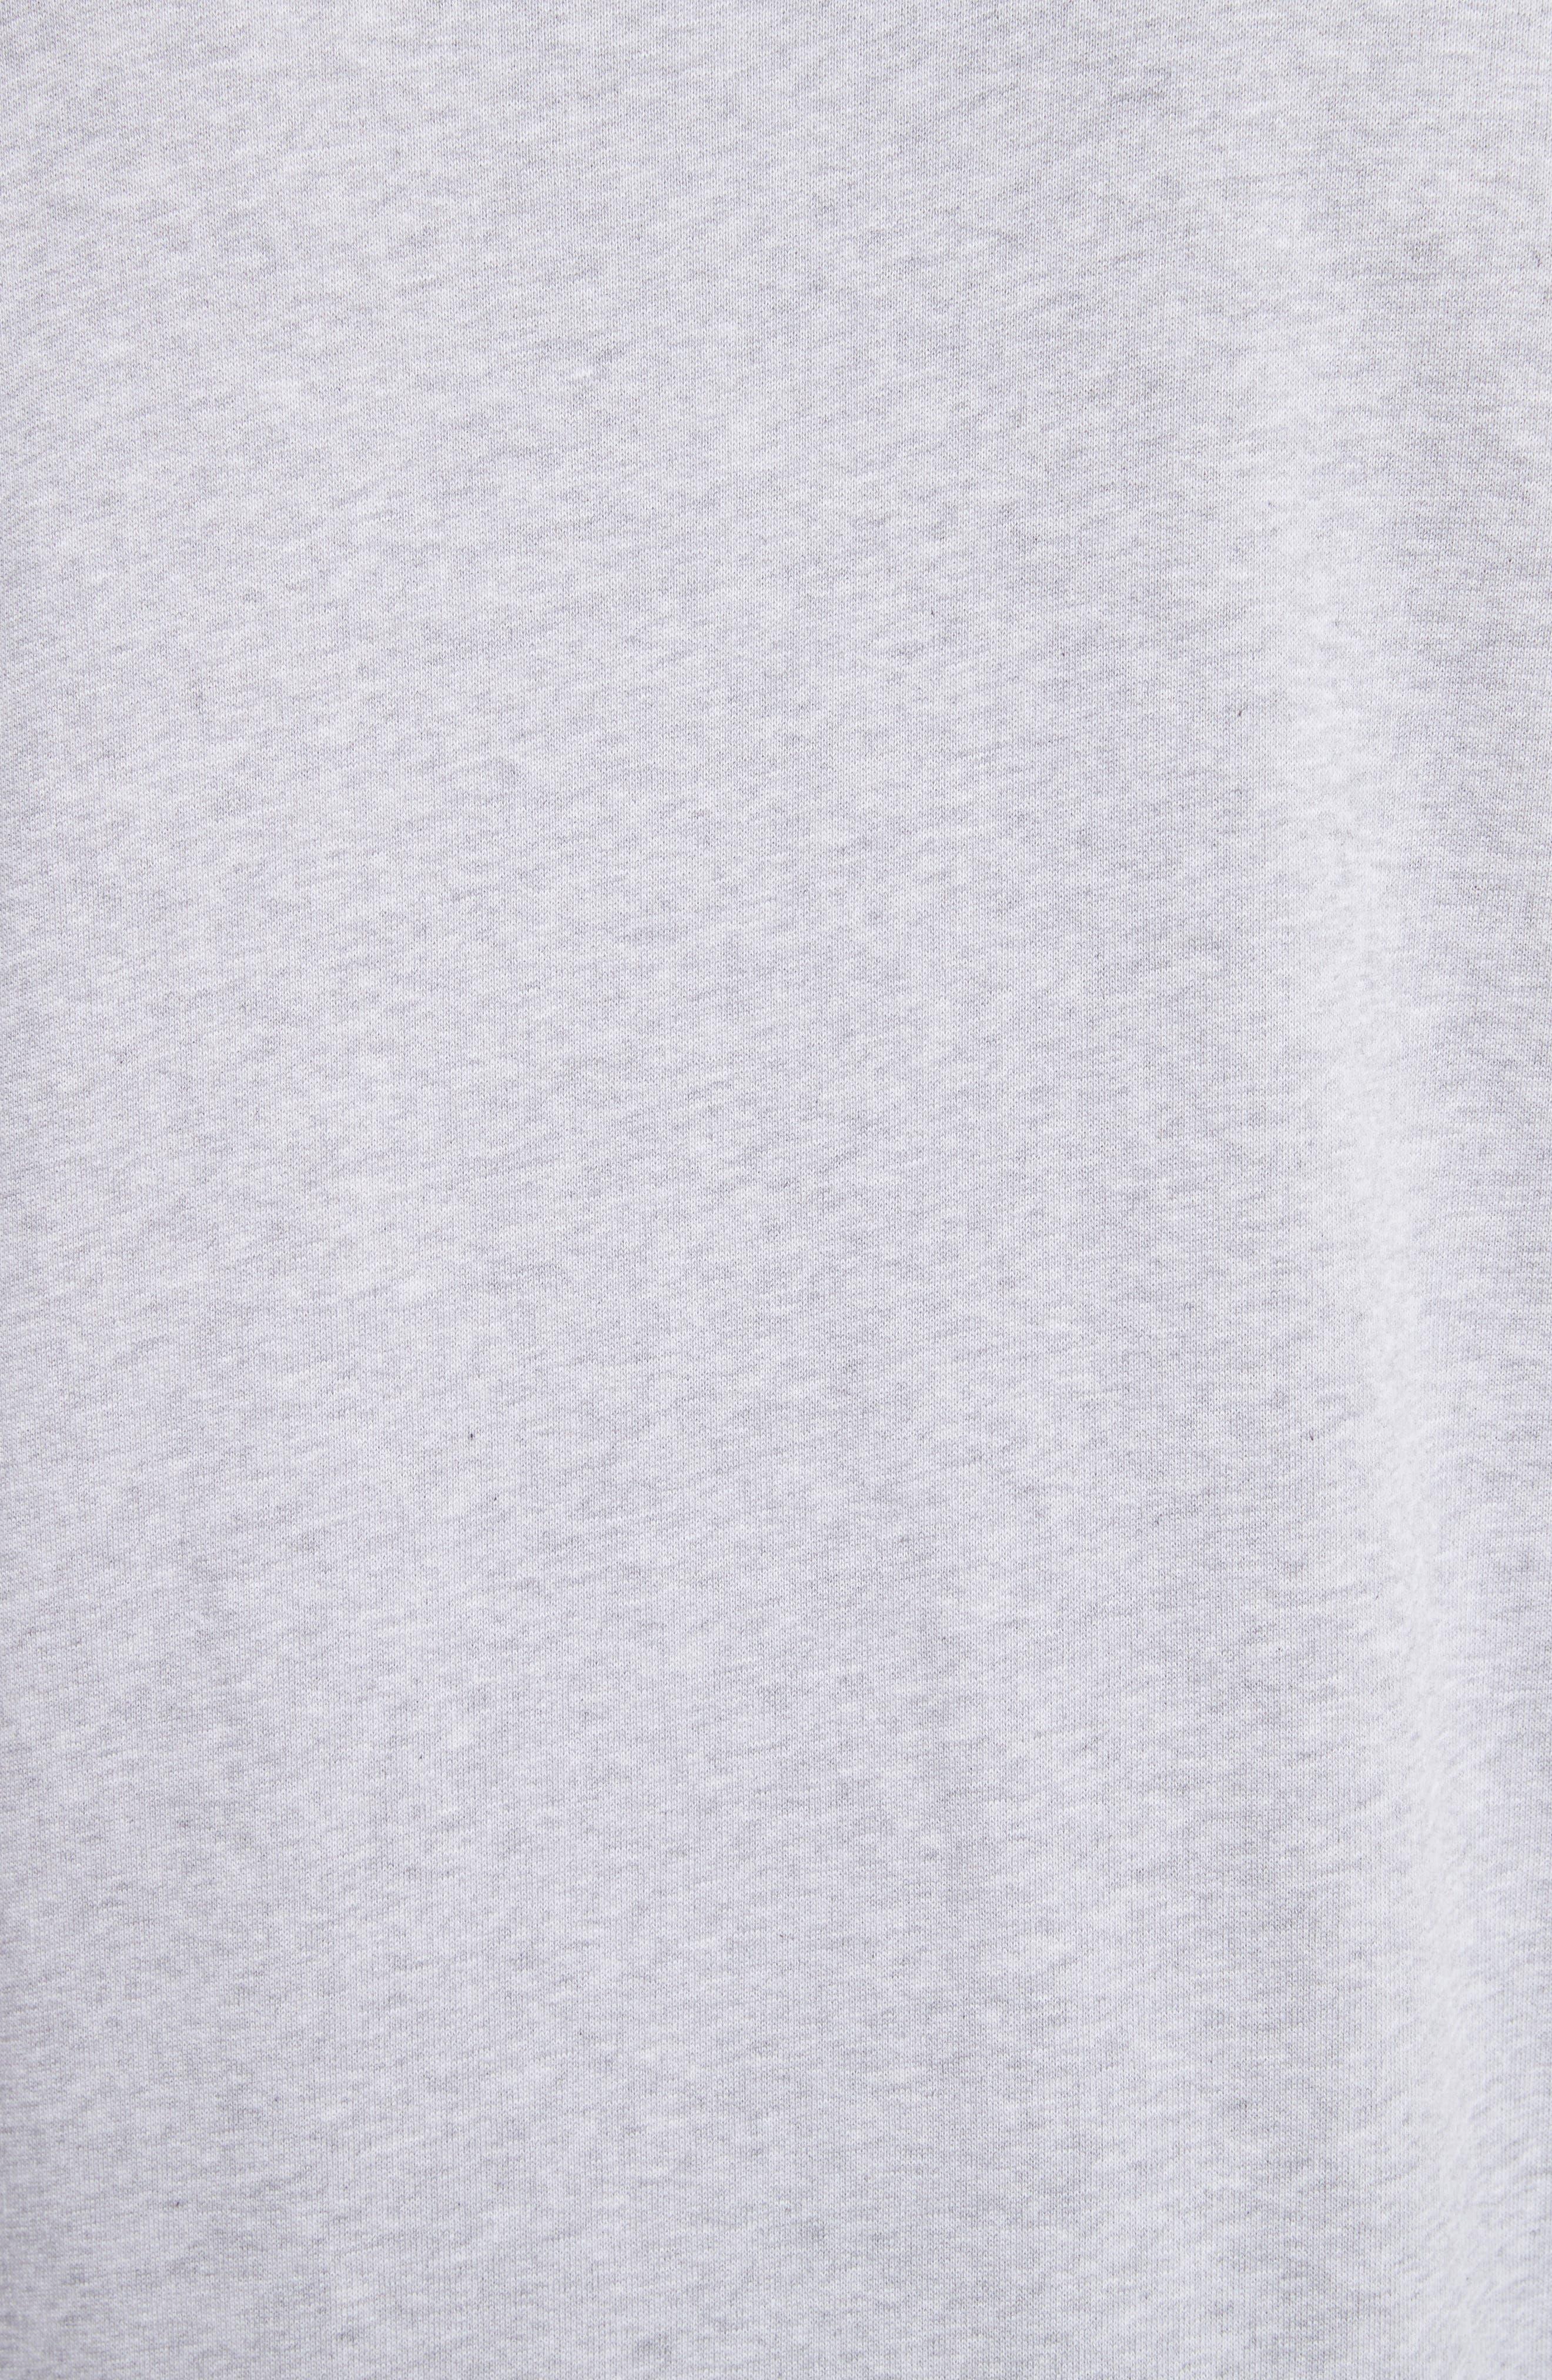 Zip Sleeve Crewneck Sweatshirt,                             Alternate thumbnail 5, color,                             GREY